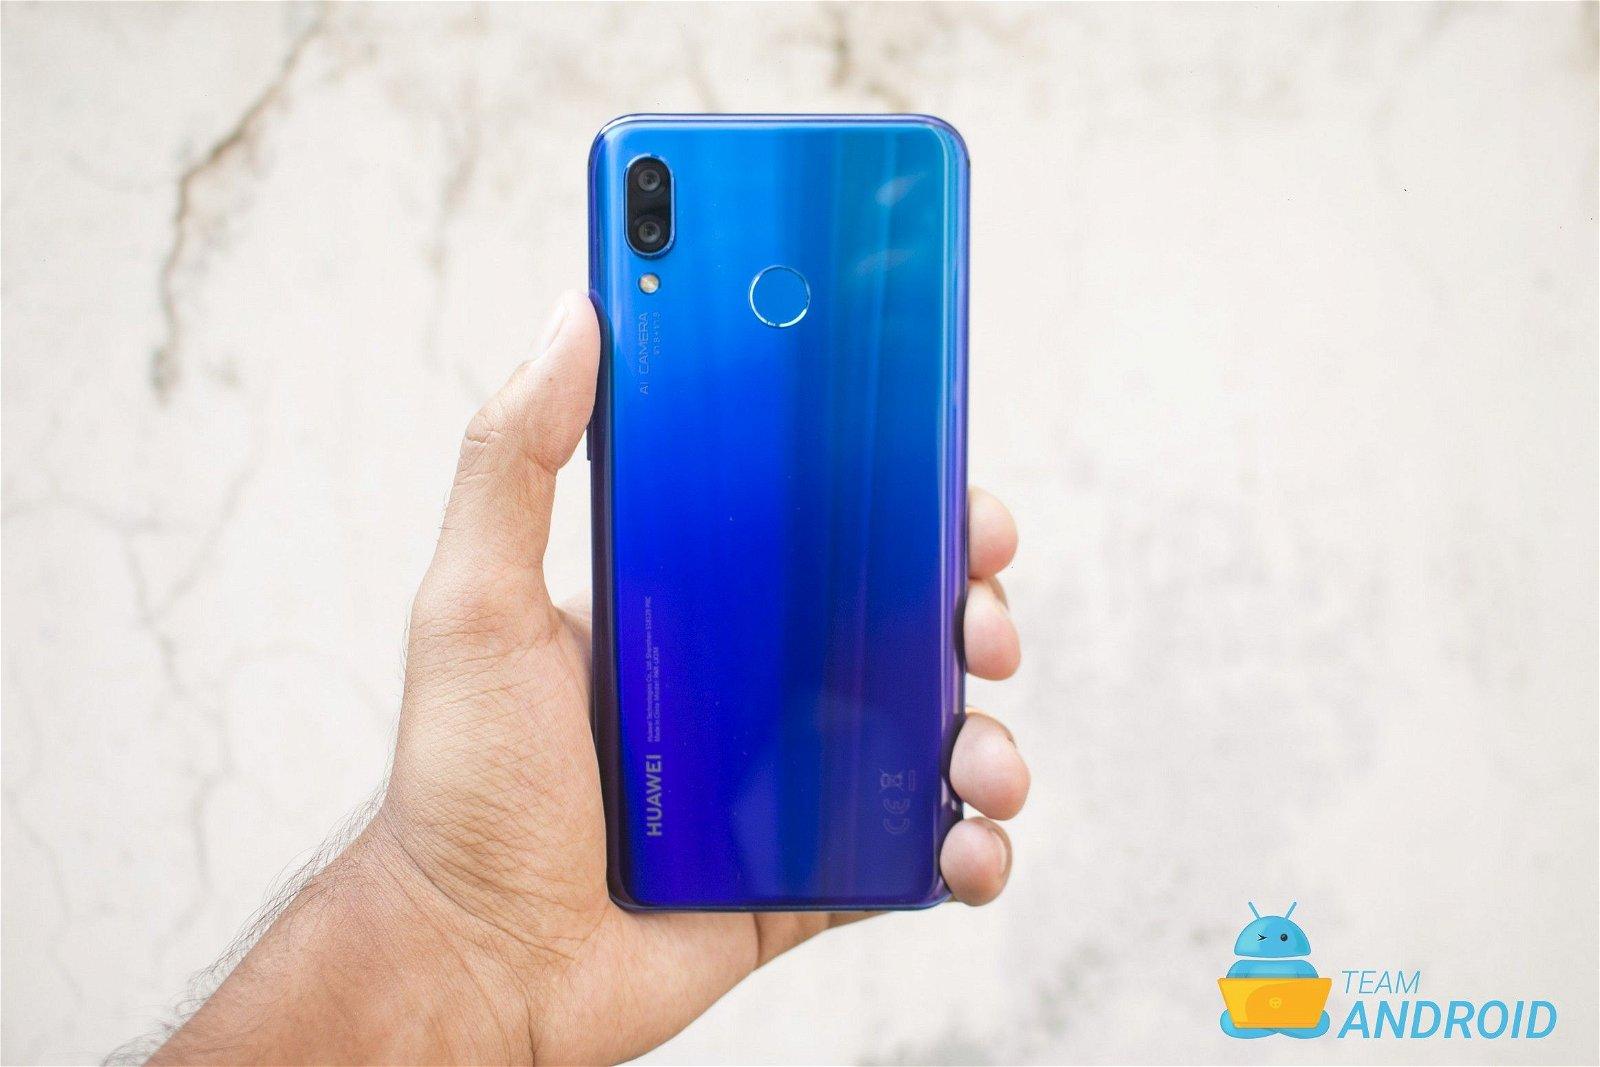 Huawei Nova 3 Review - Beautiful Phone with Powerful Internals 83